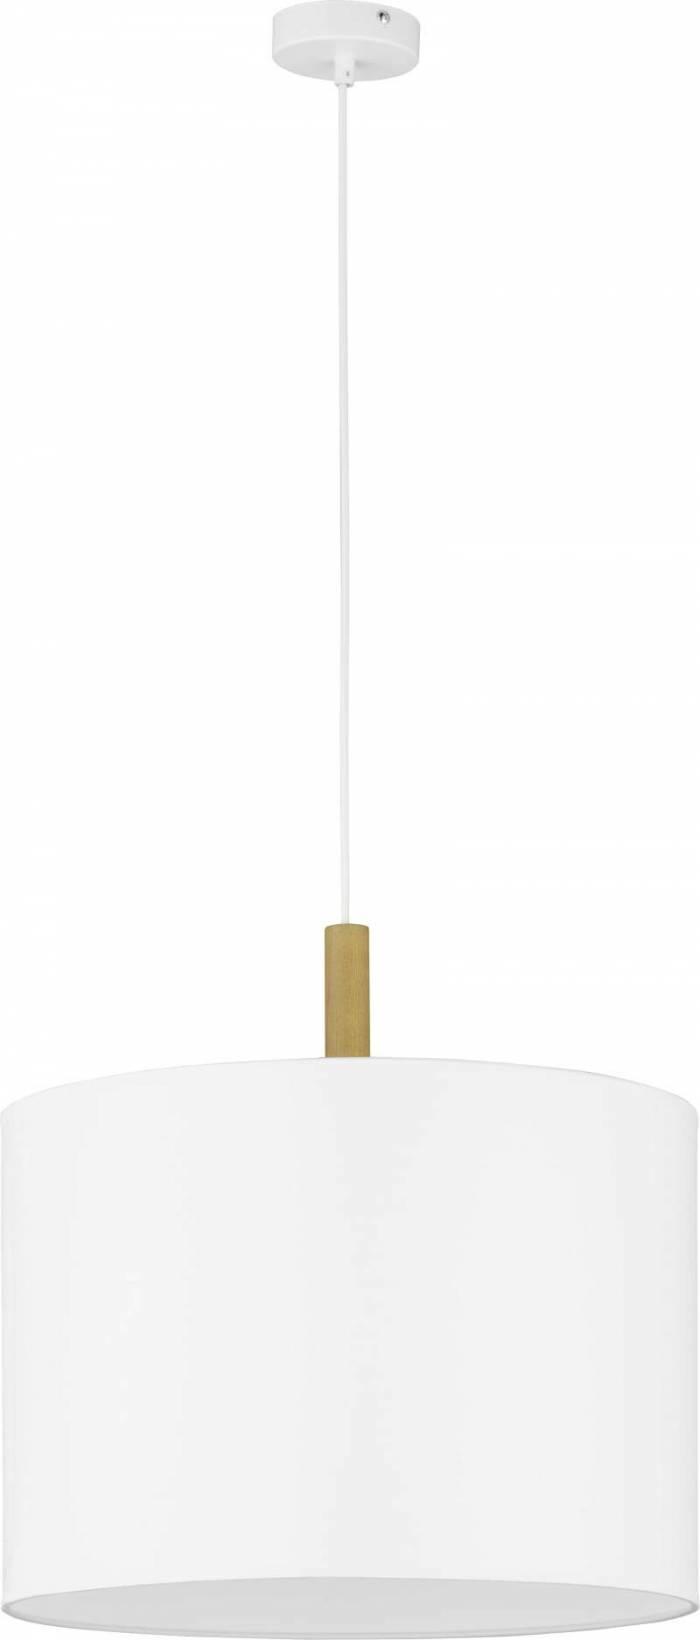 Lustră pendul Tomoko, 110x50x50 cm, lemn/ metal, alb/ pin